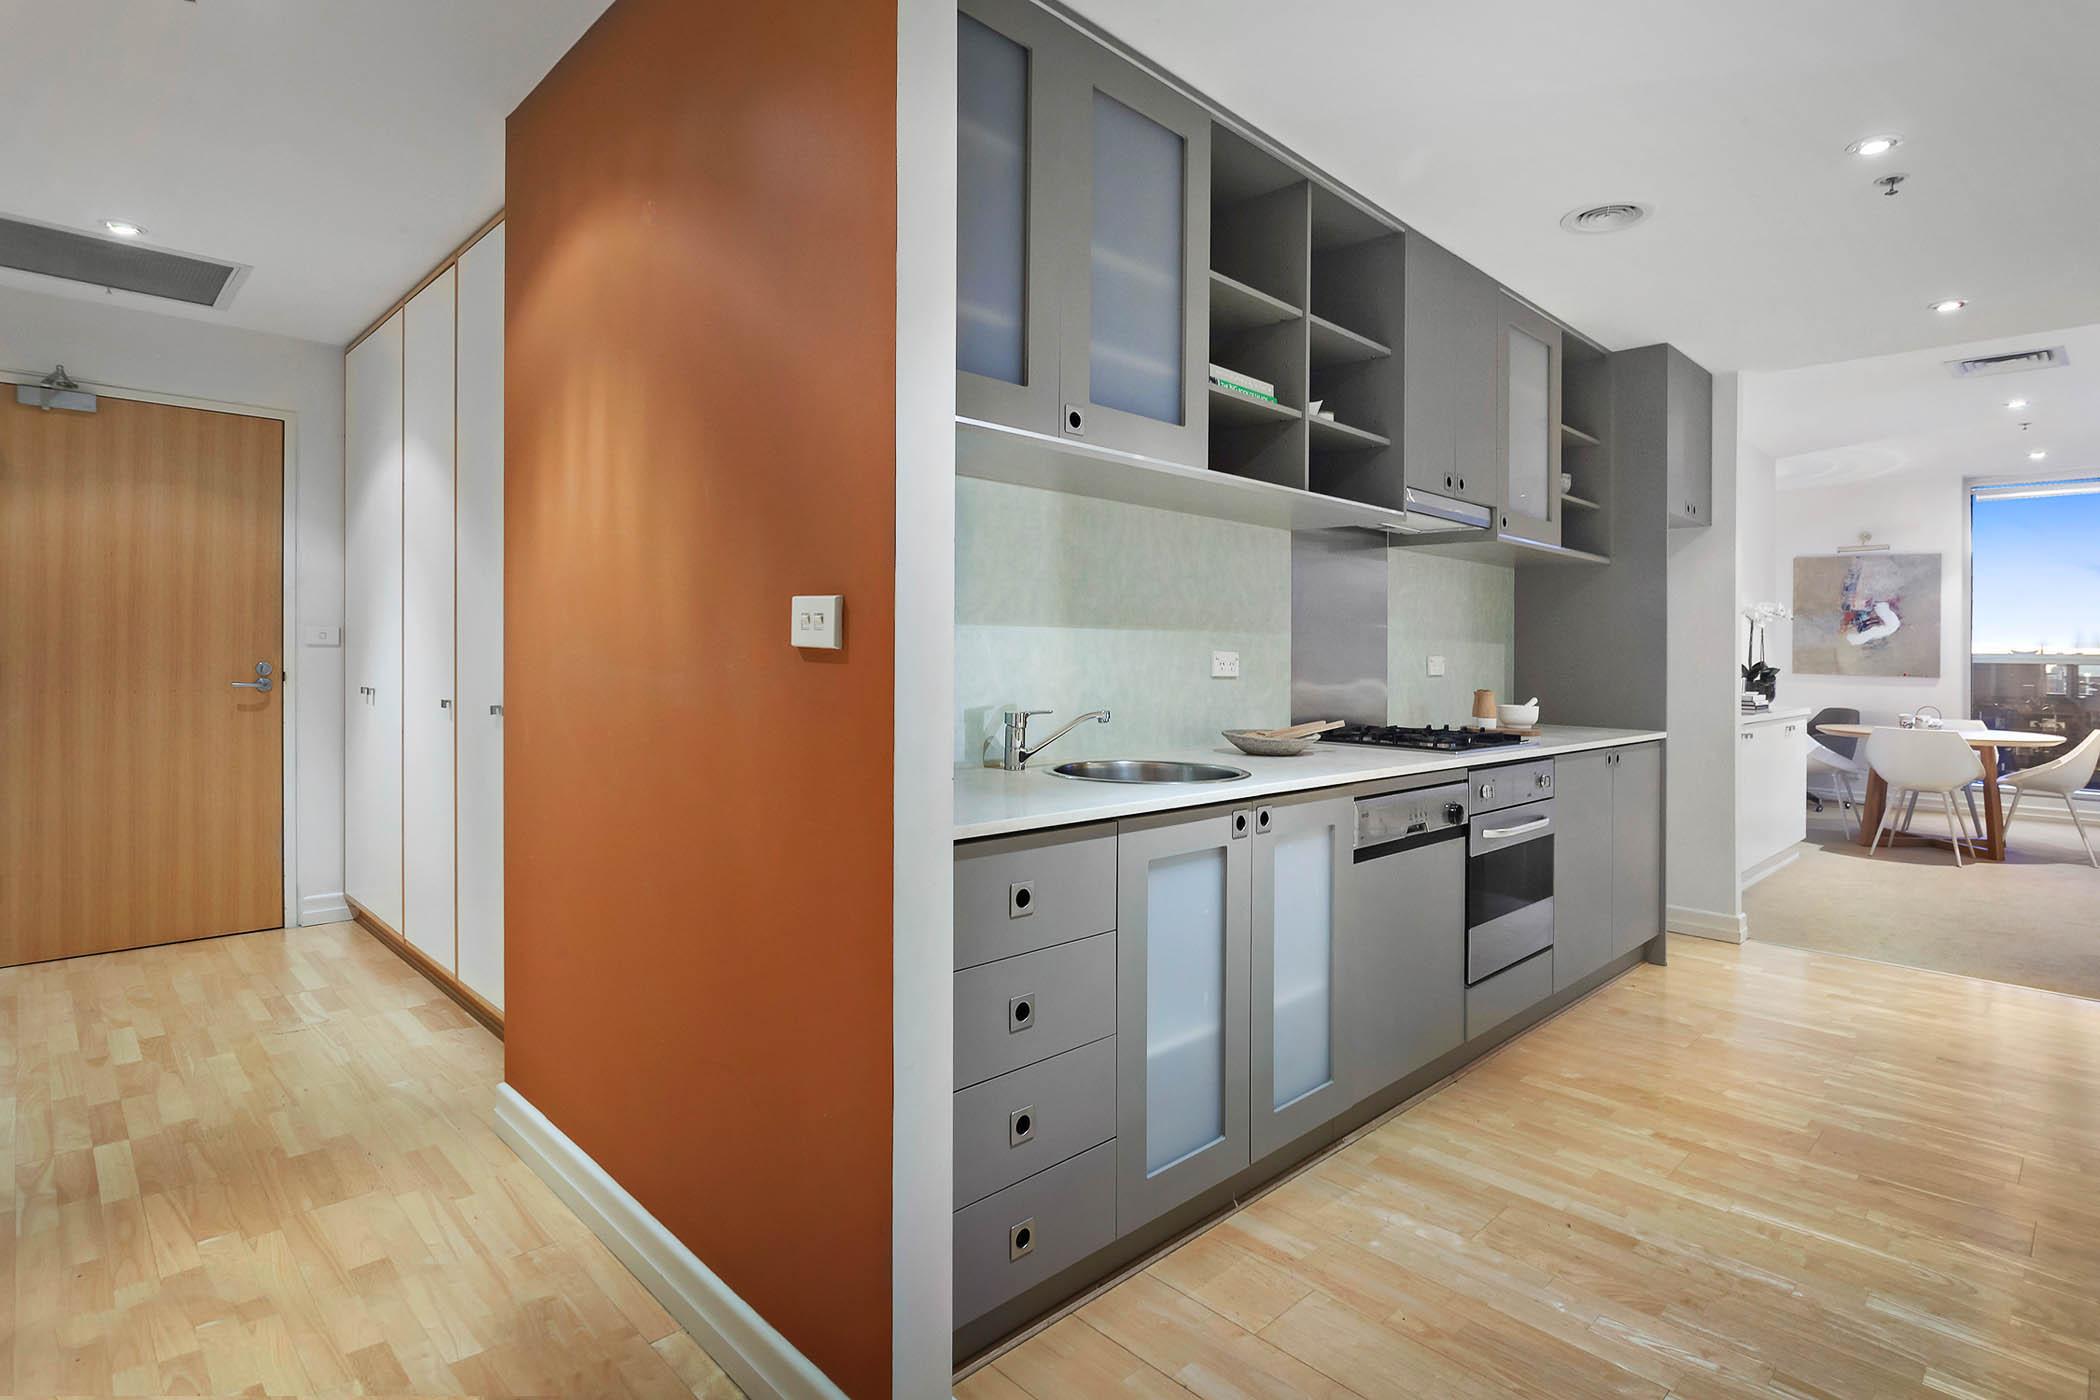 1804-31-spring-street-melbourne-student-accommodation-Melbourne-Kitchen-Unilodgers